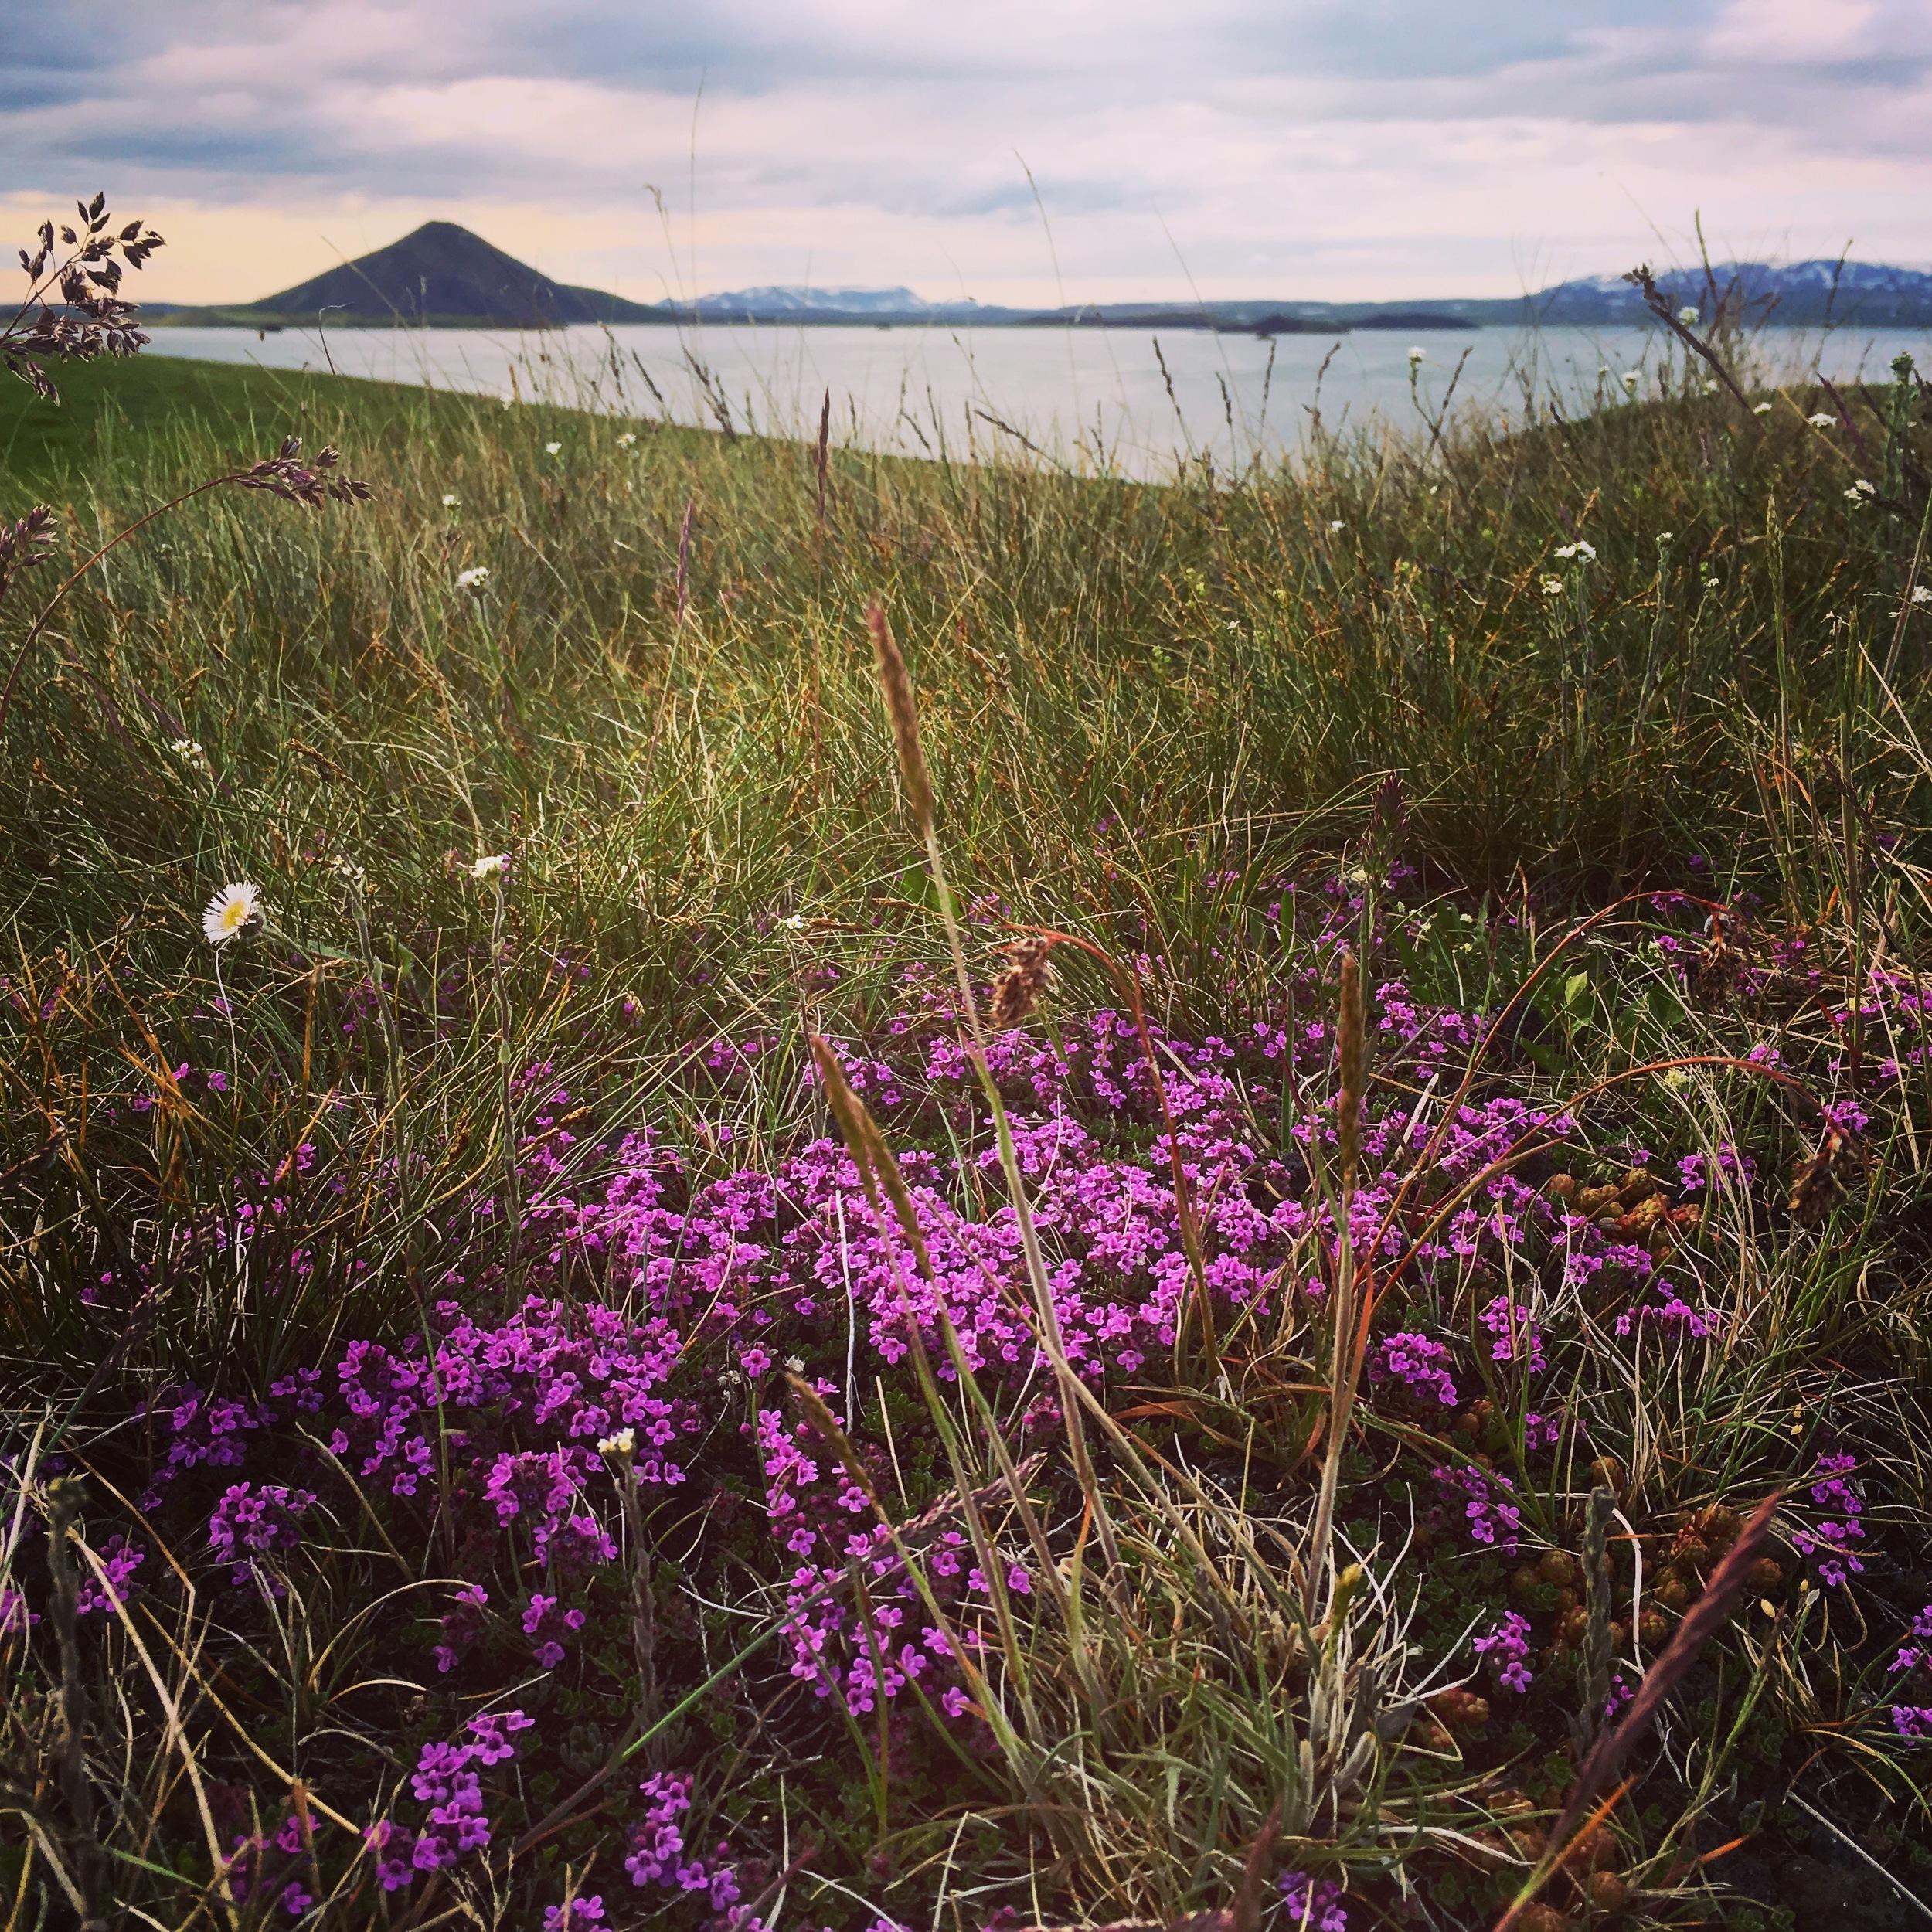 Iceland Landscape by Boston Photographer Erica Derrickson